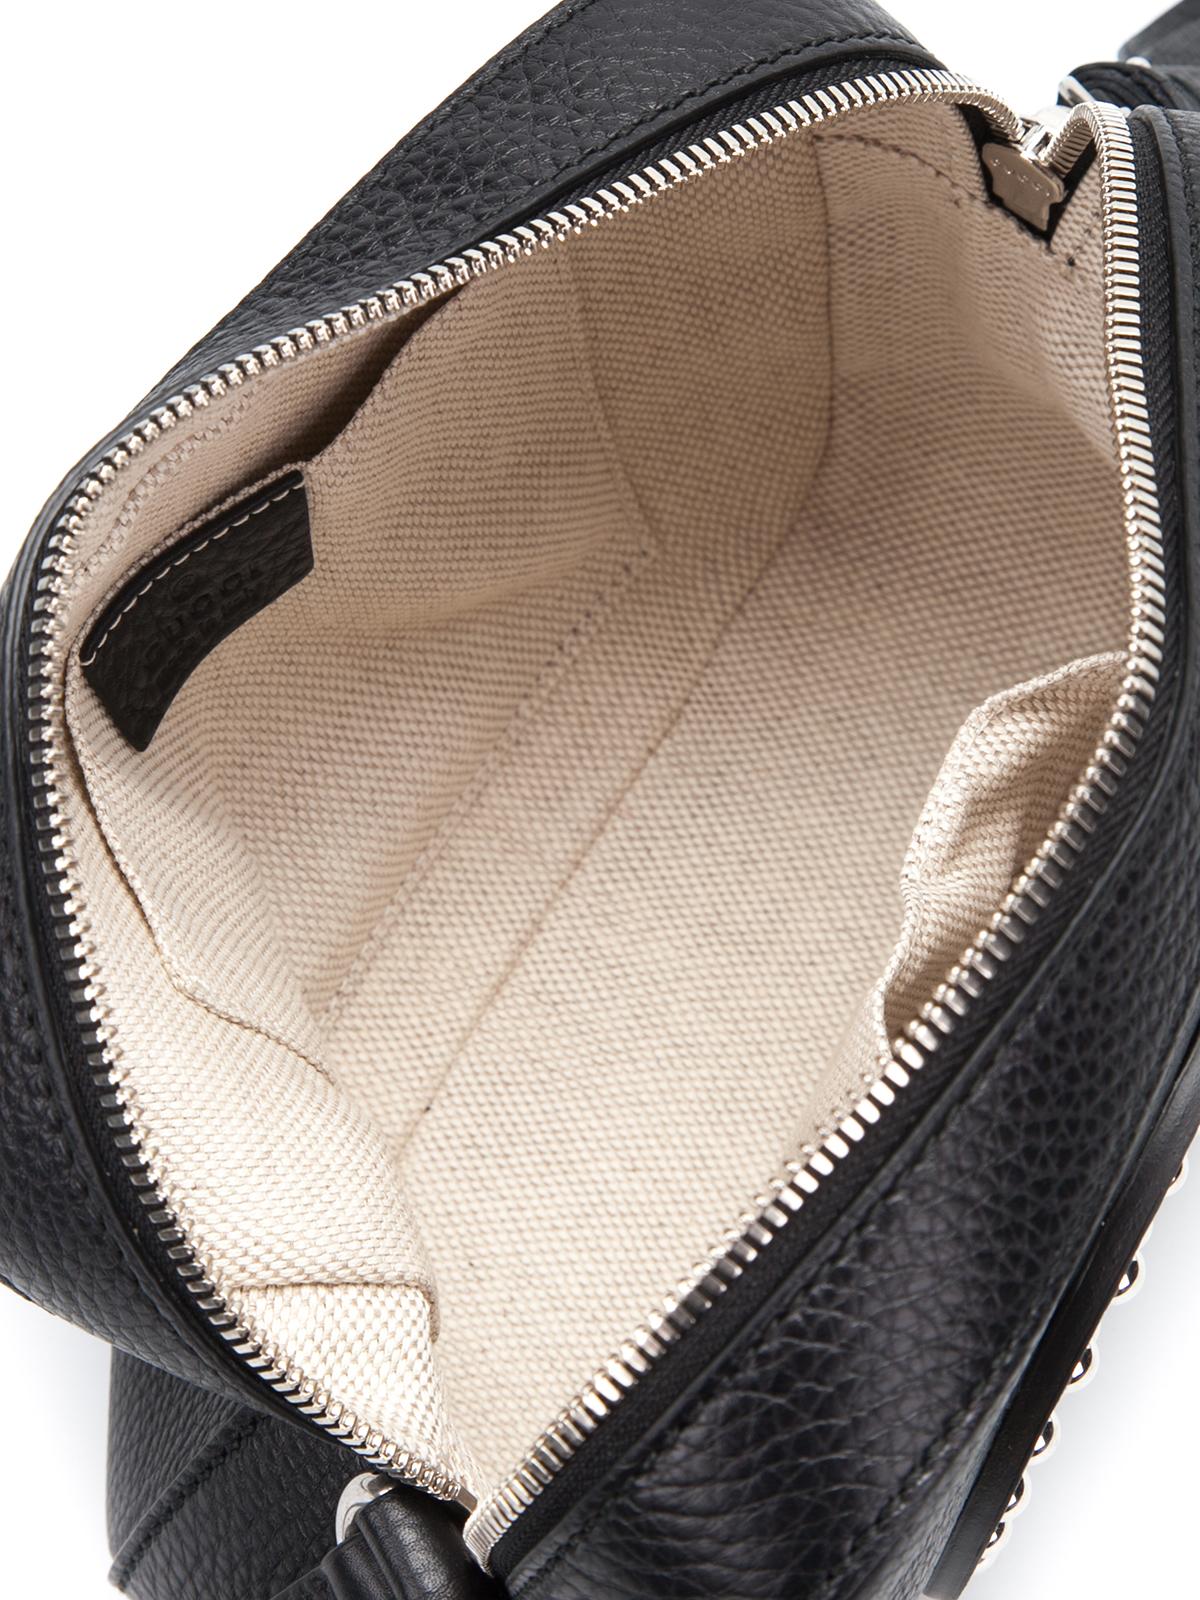 Gucci Soho Studded Leather Disco Bag Shoulder Bags 308364 Ikrix